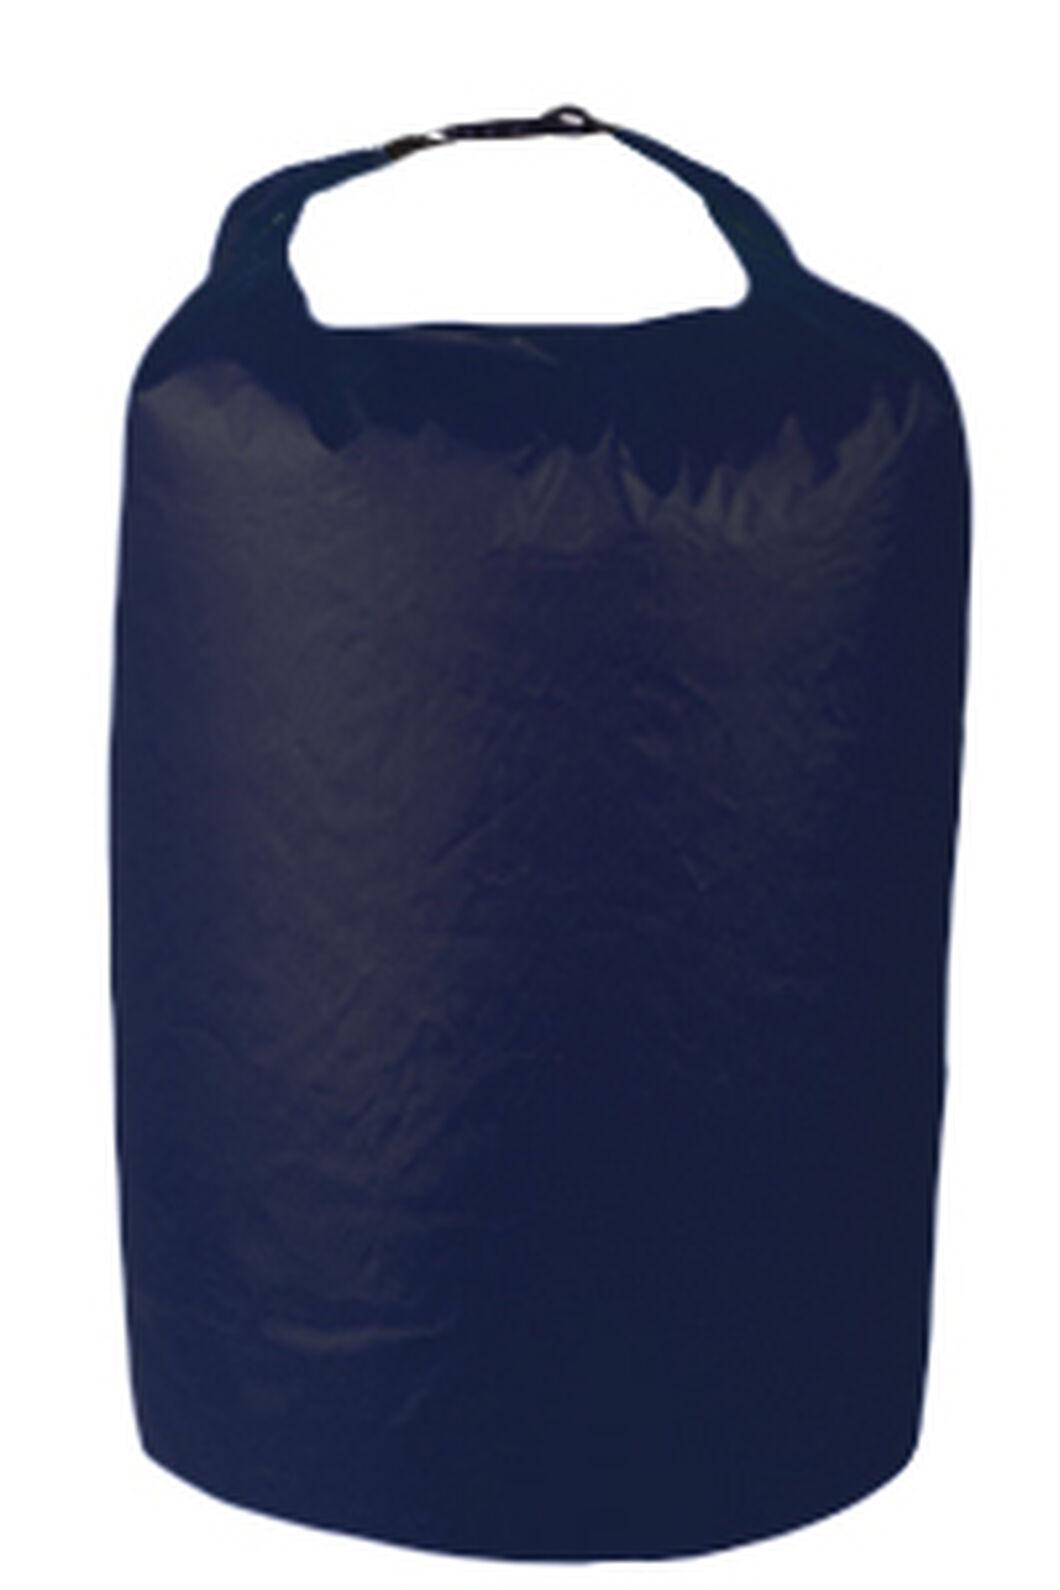 Macpac Ultralight Dry Bag 2.5 L, Sodalite Blue, hi-res